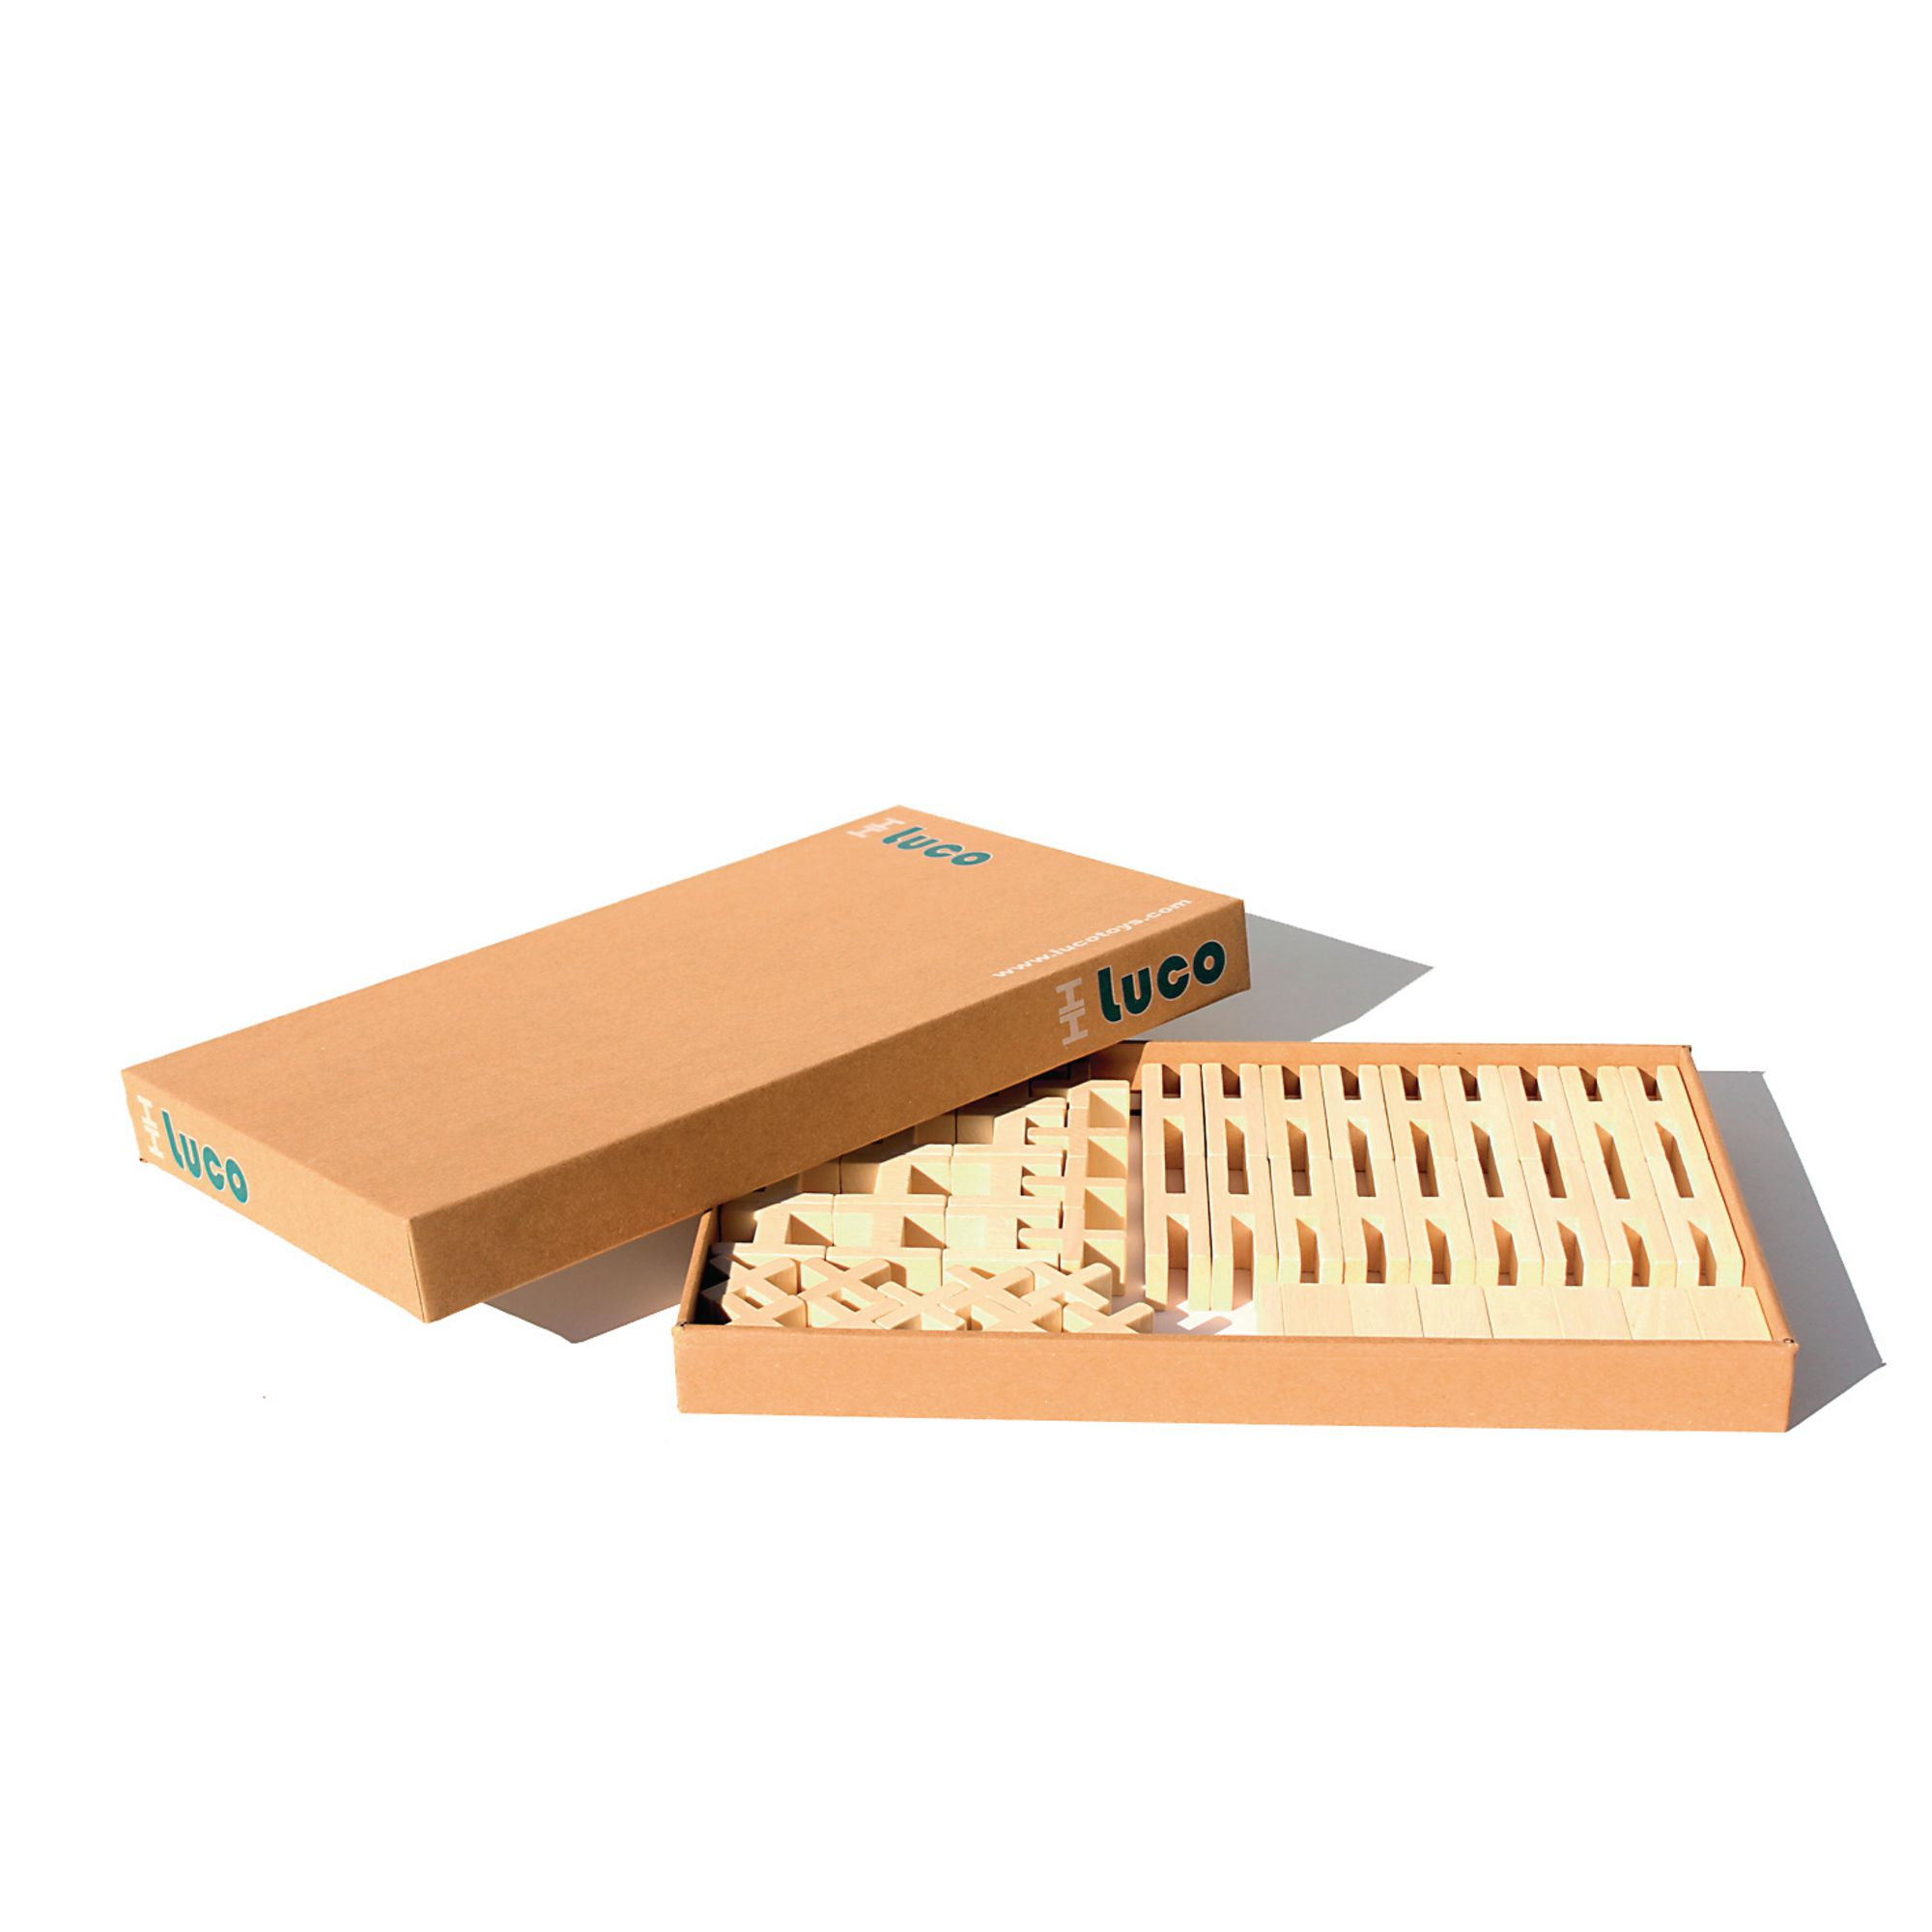 Millhouse - Luco Bricks Natural - Natural Pack of 65